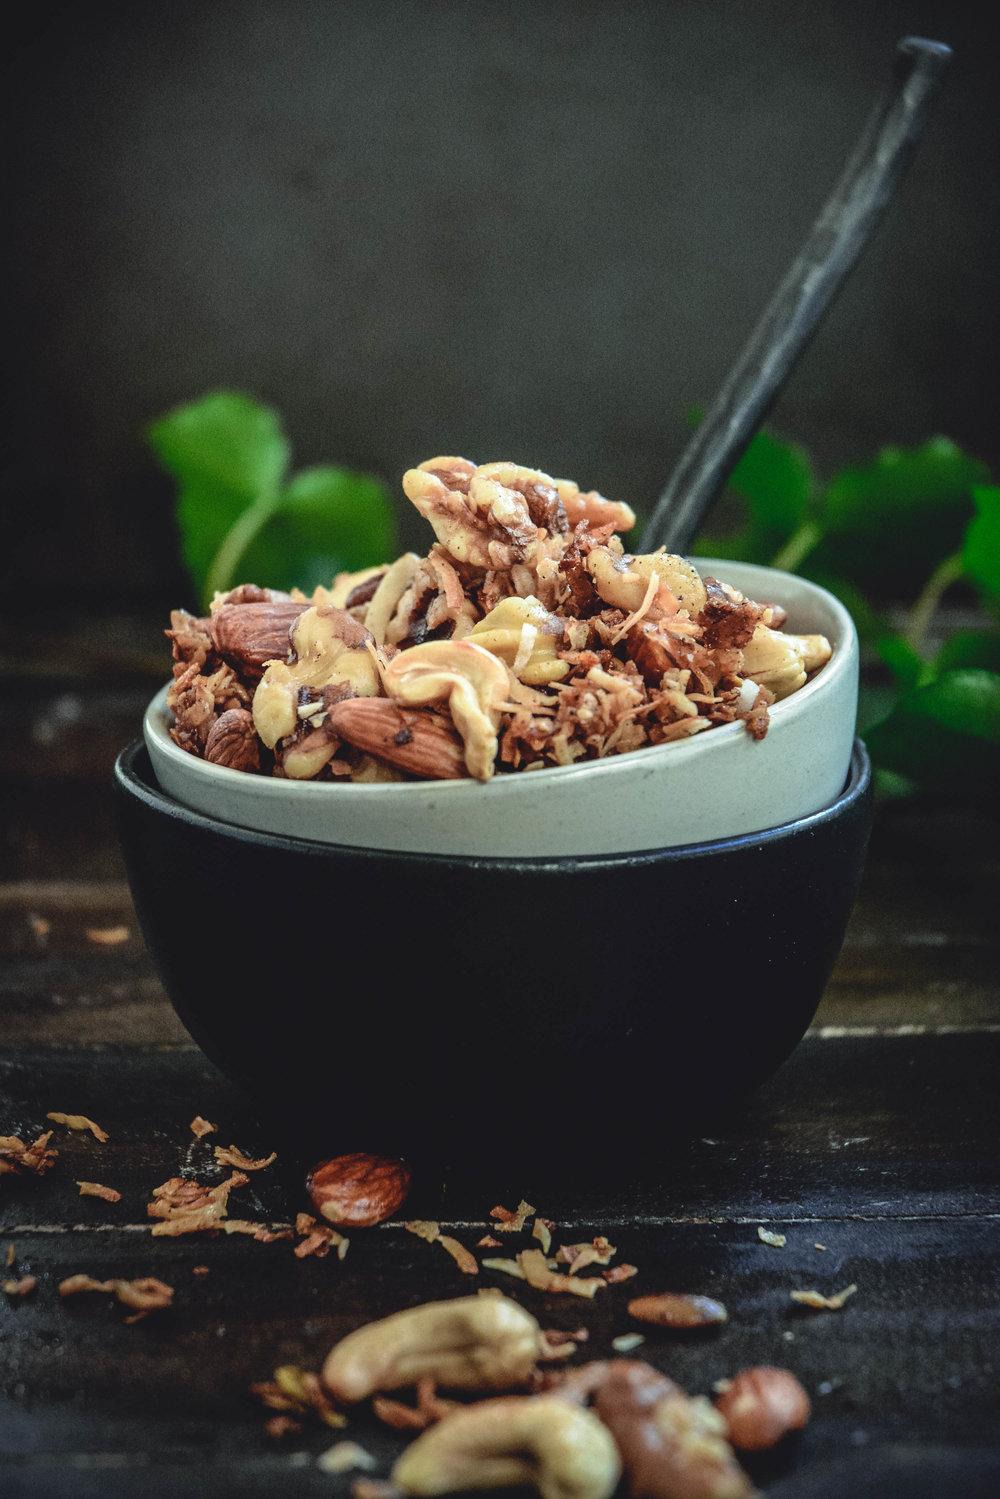 walnuts, pecans, almonds, coconut flakes, cashews, pumpkin seeds